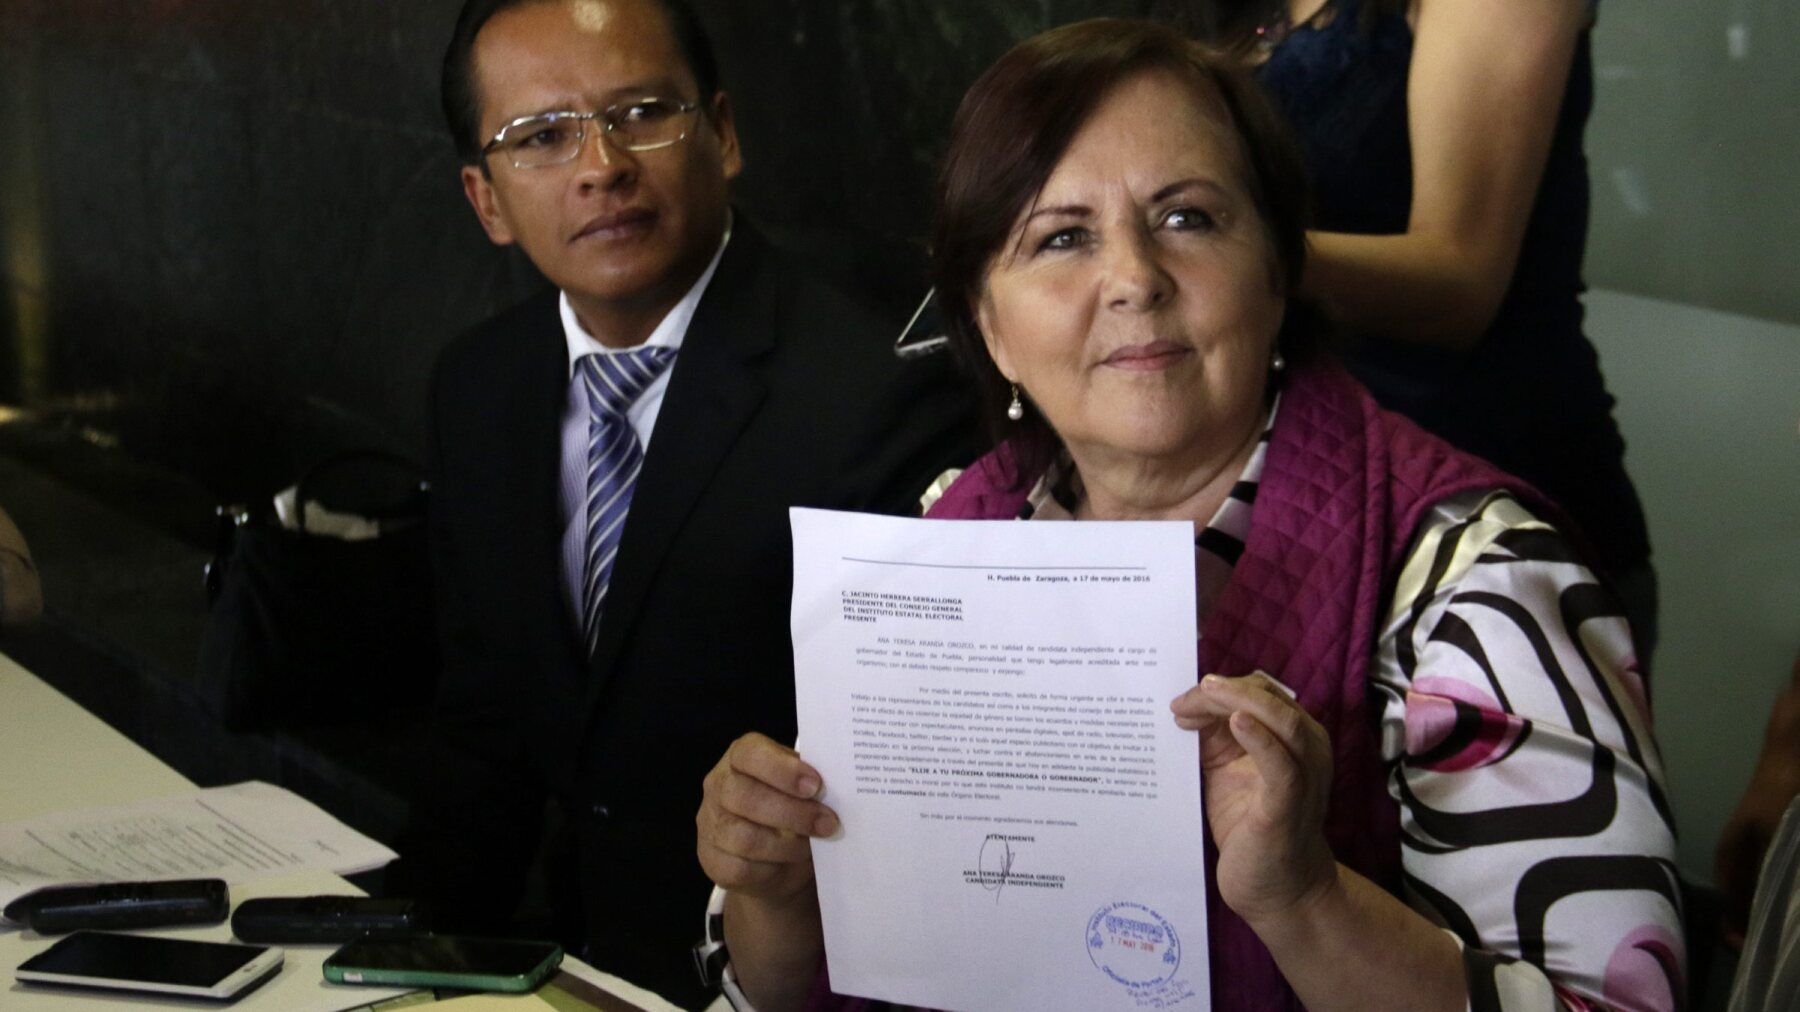 La candidata Ana Teresa Aranda rechaza fijarse plazos, pero plantea una serie de propuestas proritarias.